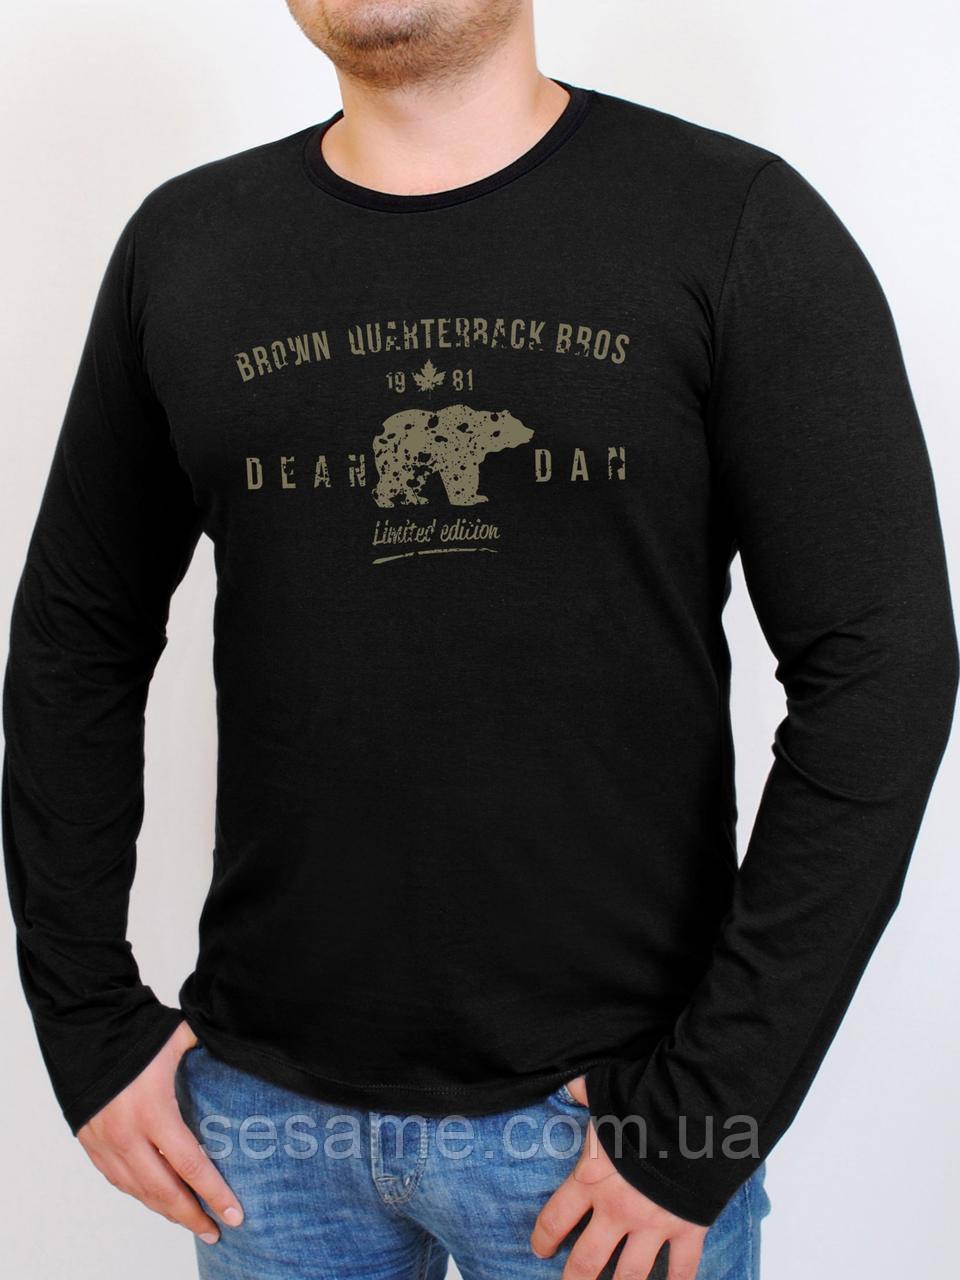 grand ua BROWN LONG футболка длинный рукав